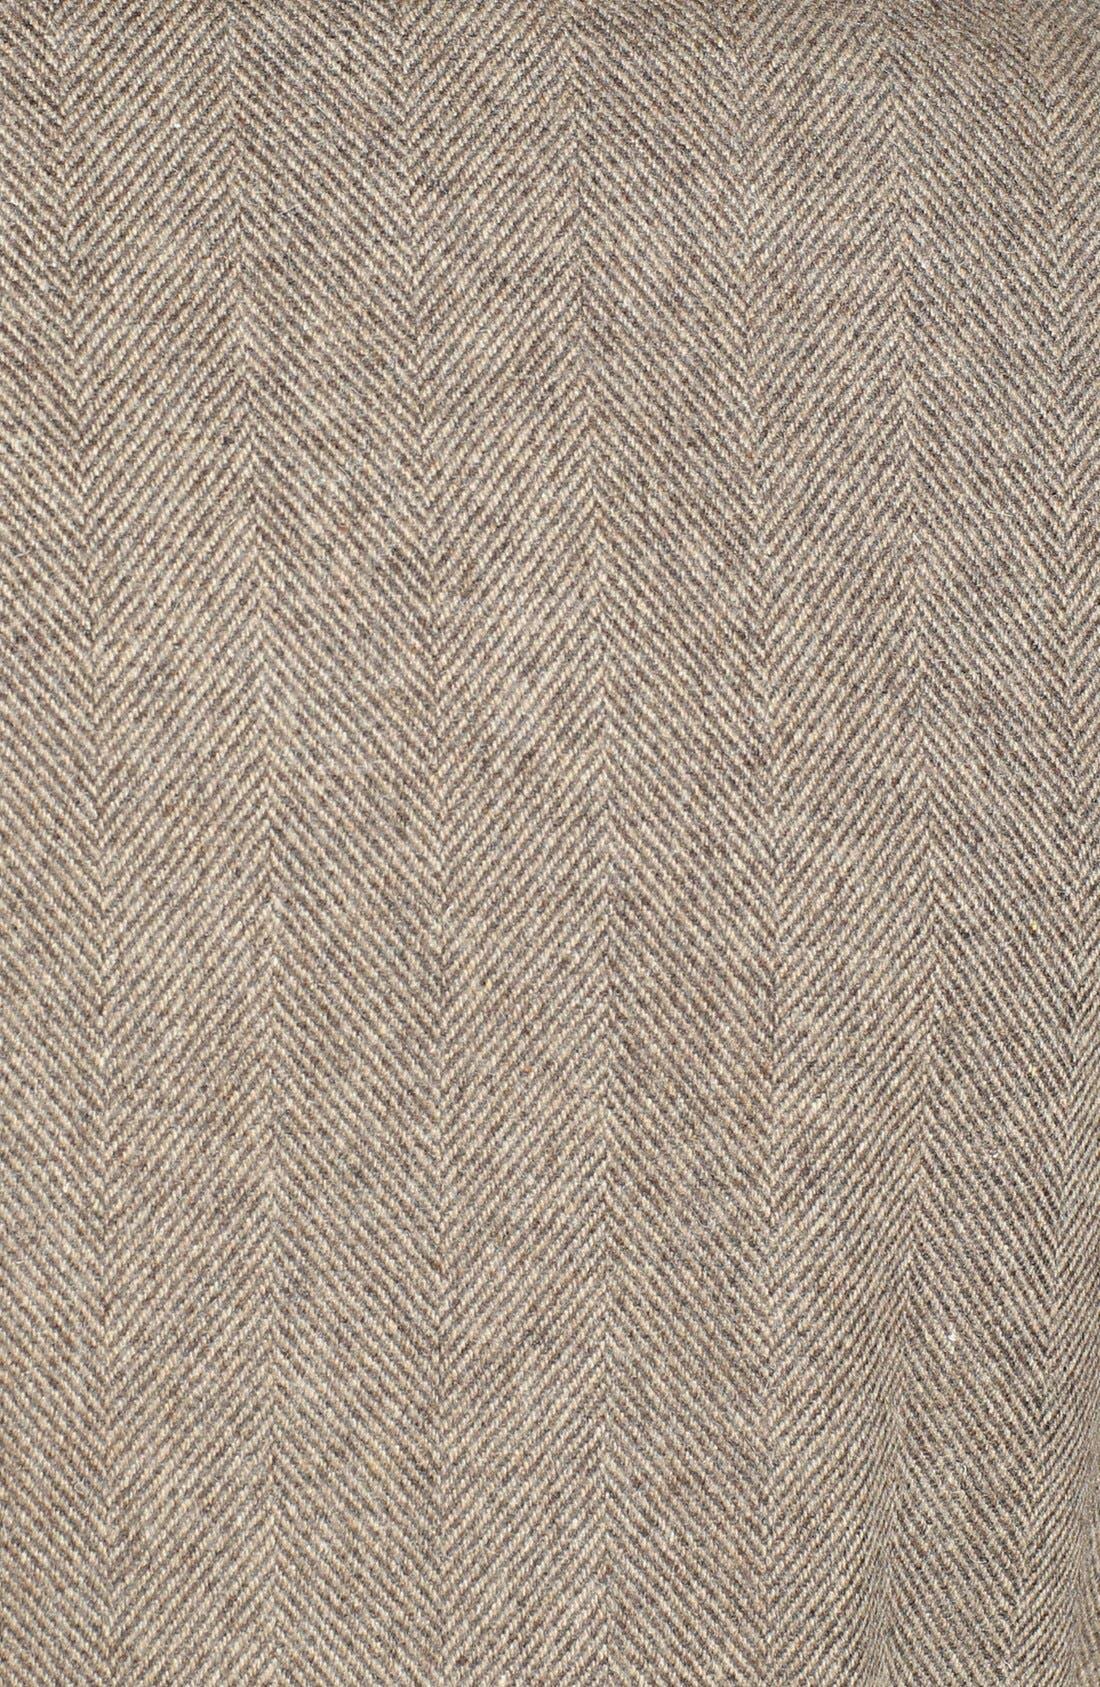 Alternate Image 3  - Ted Baker London 'Zainab' Herringbone Coat